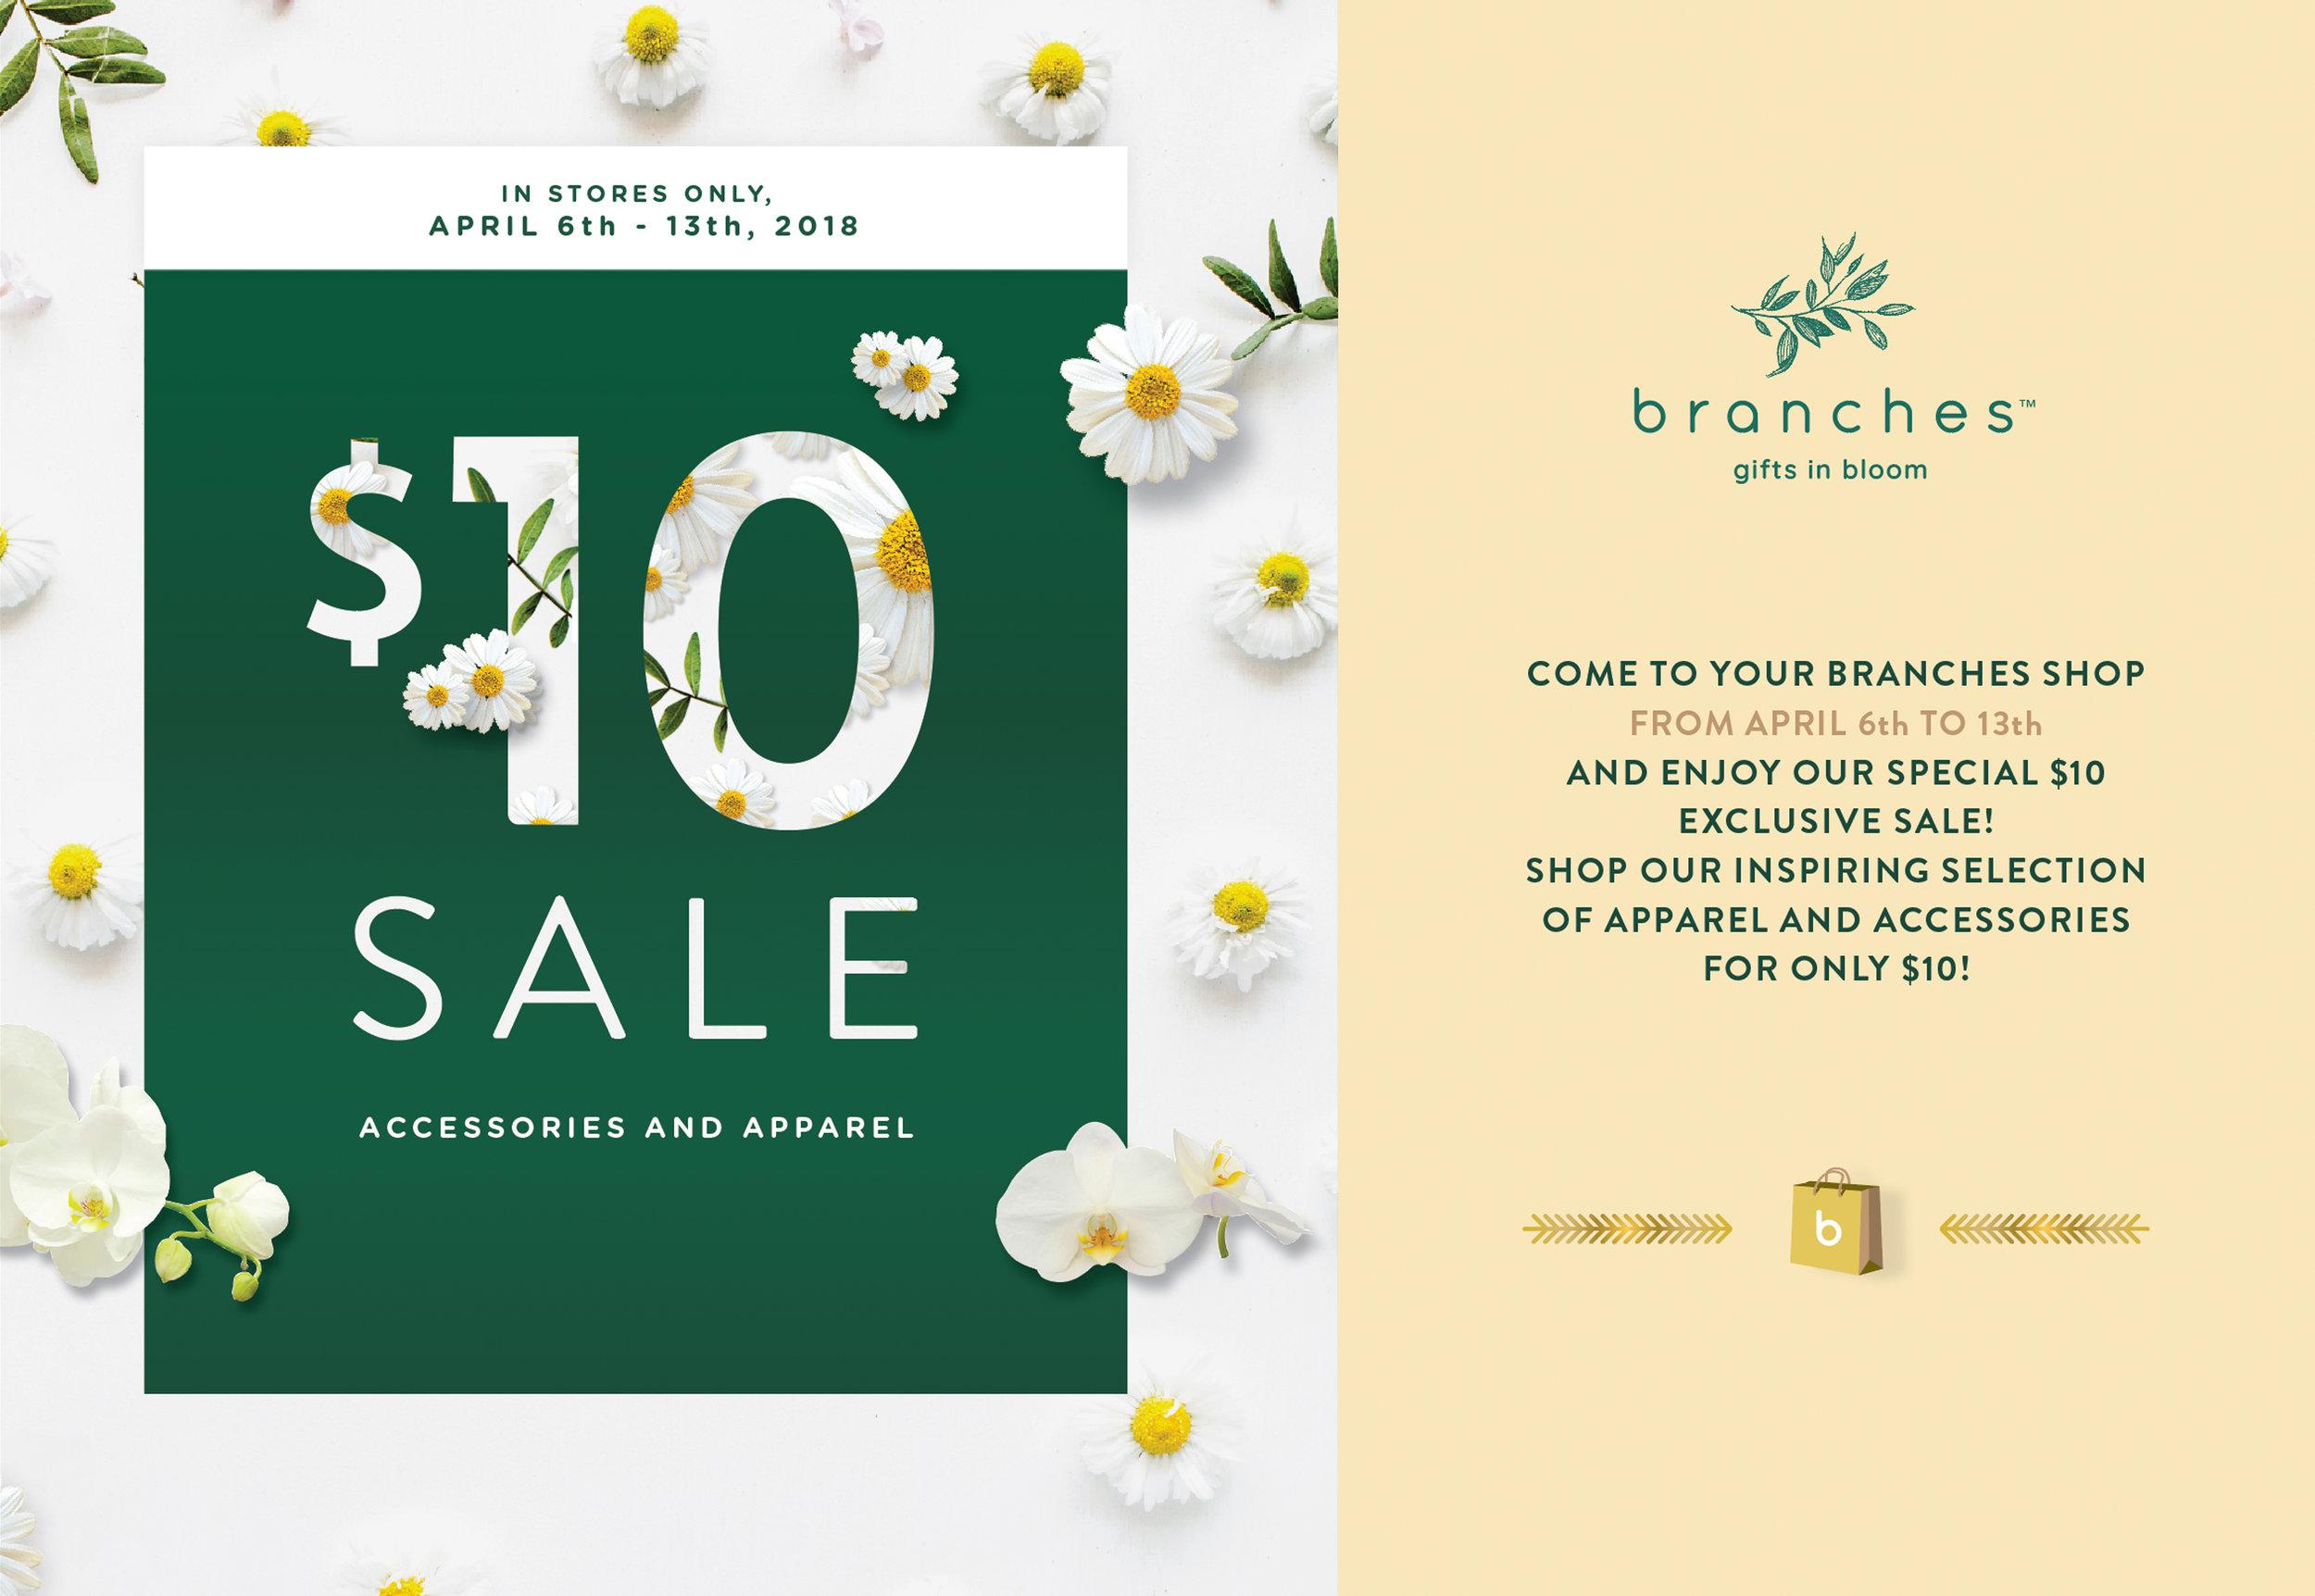 Email blast_April_$10 Sale.jpg